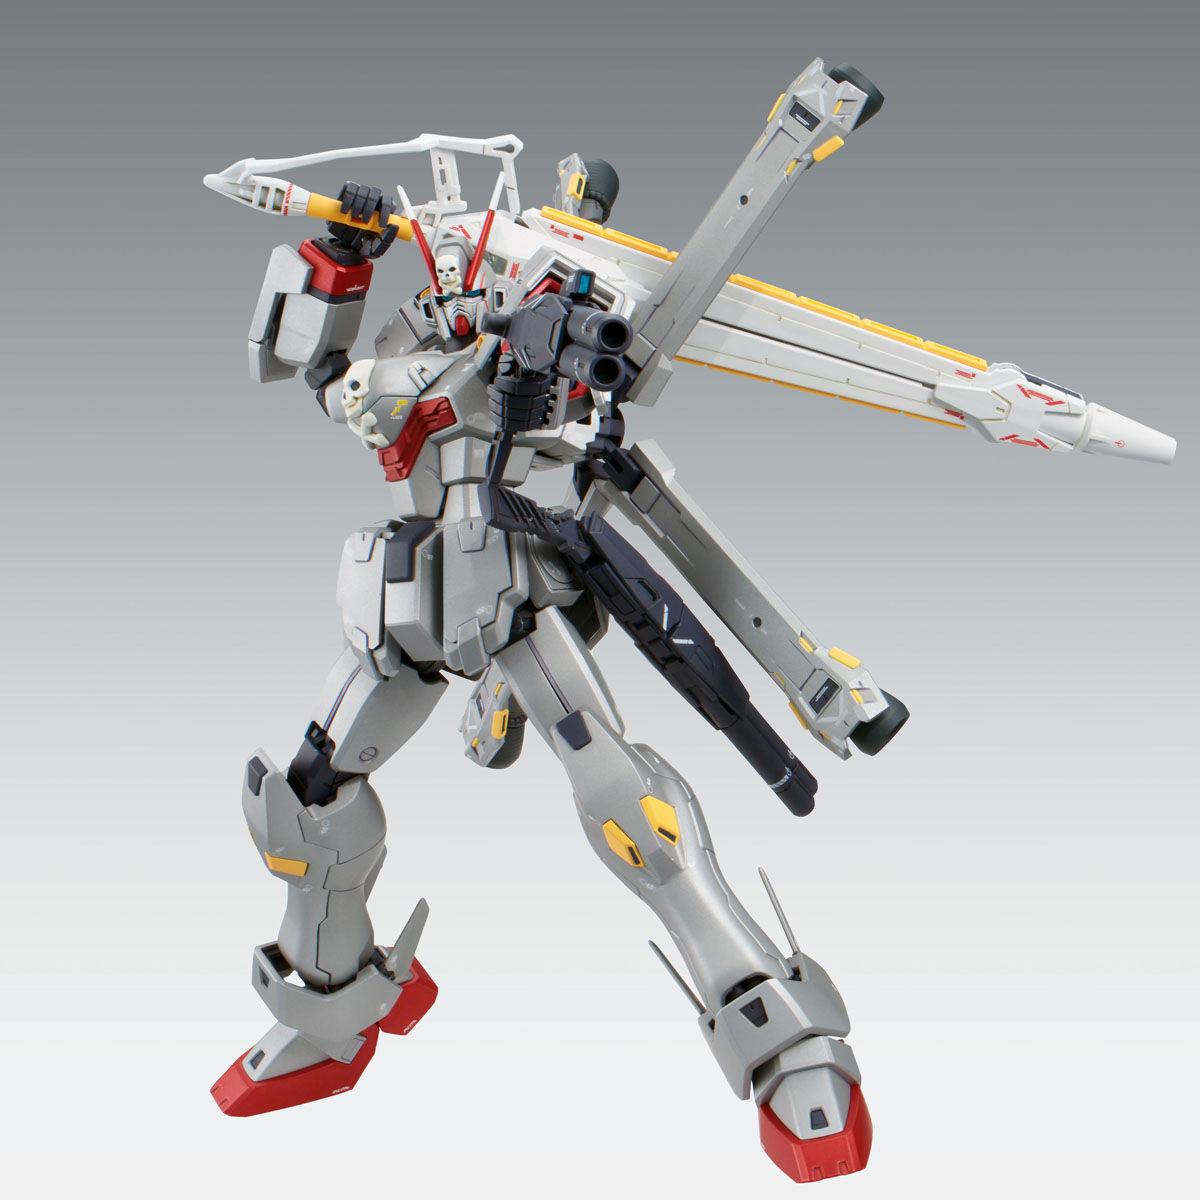 MG 1/100『クロスボーン・ガンダムX-0 Ver.Ka』プラモデル-004